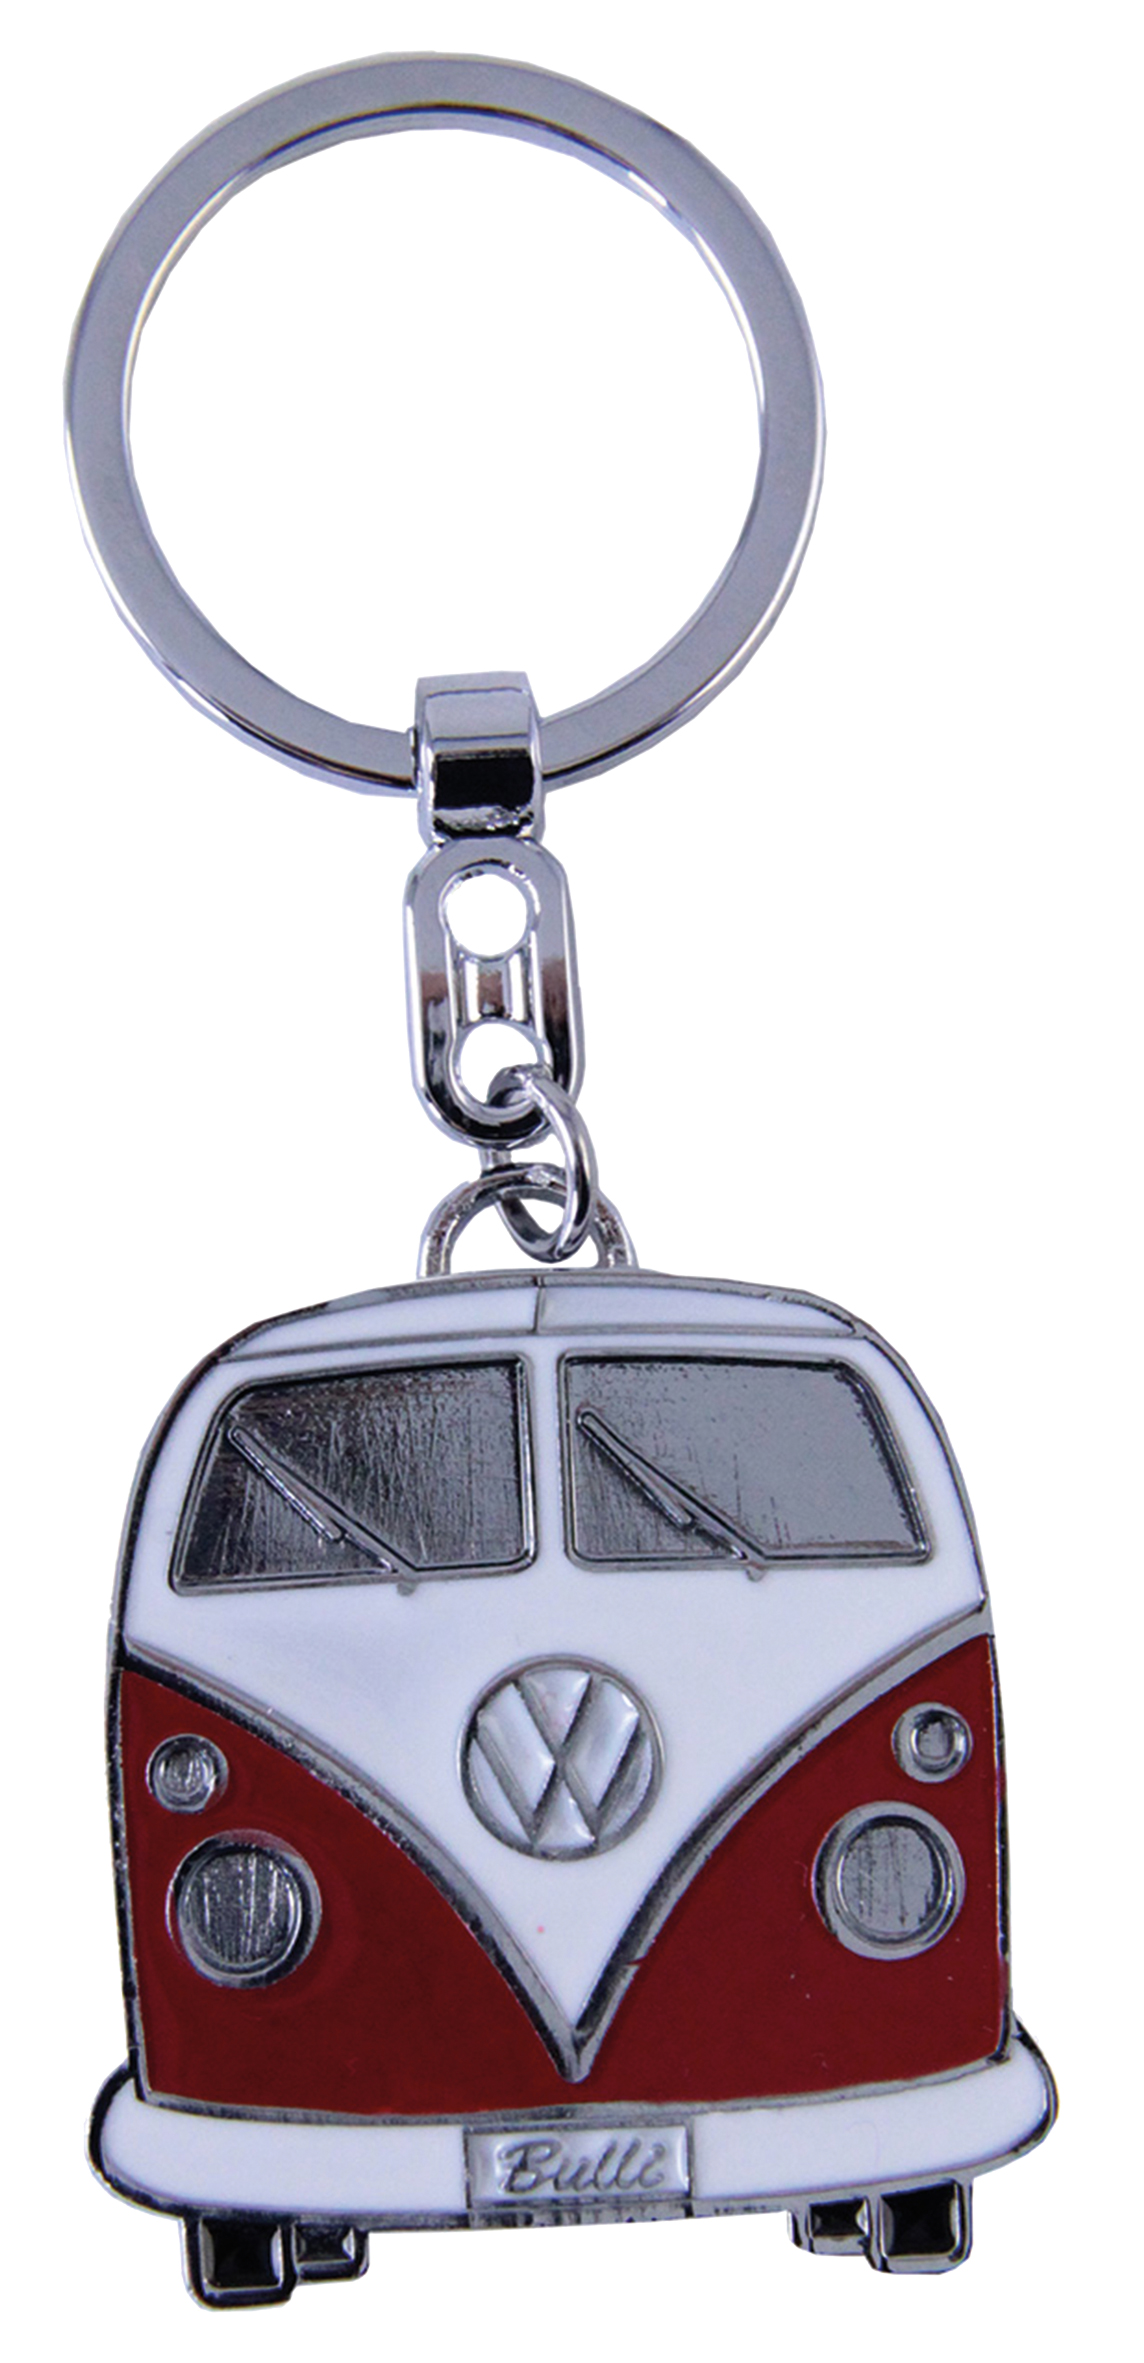 VW Collection Schlüsselanhänger bordeaux